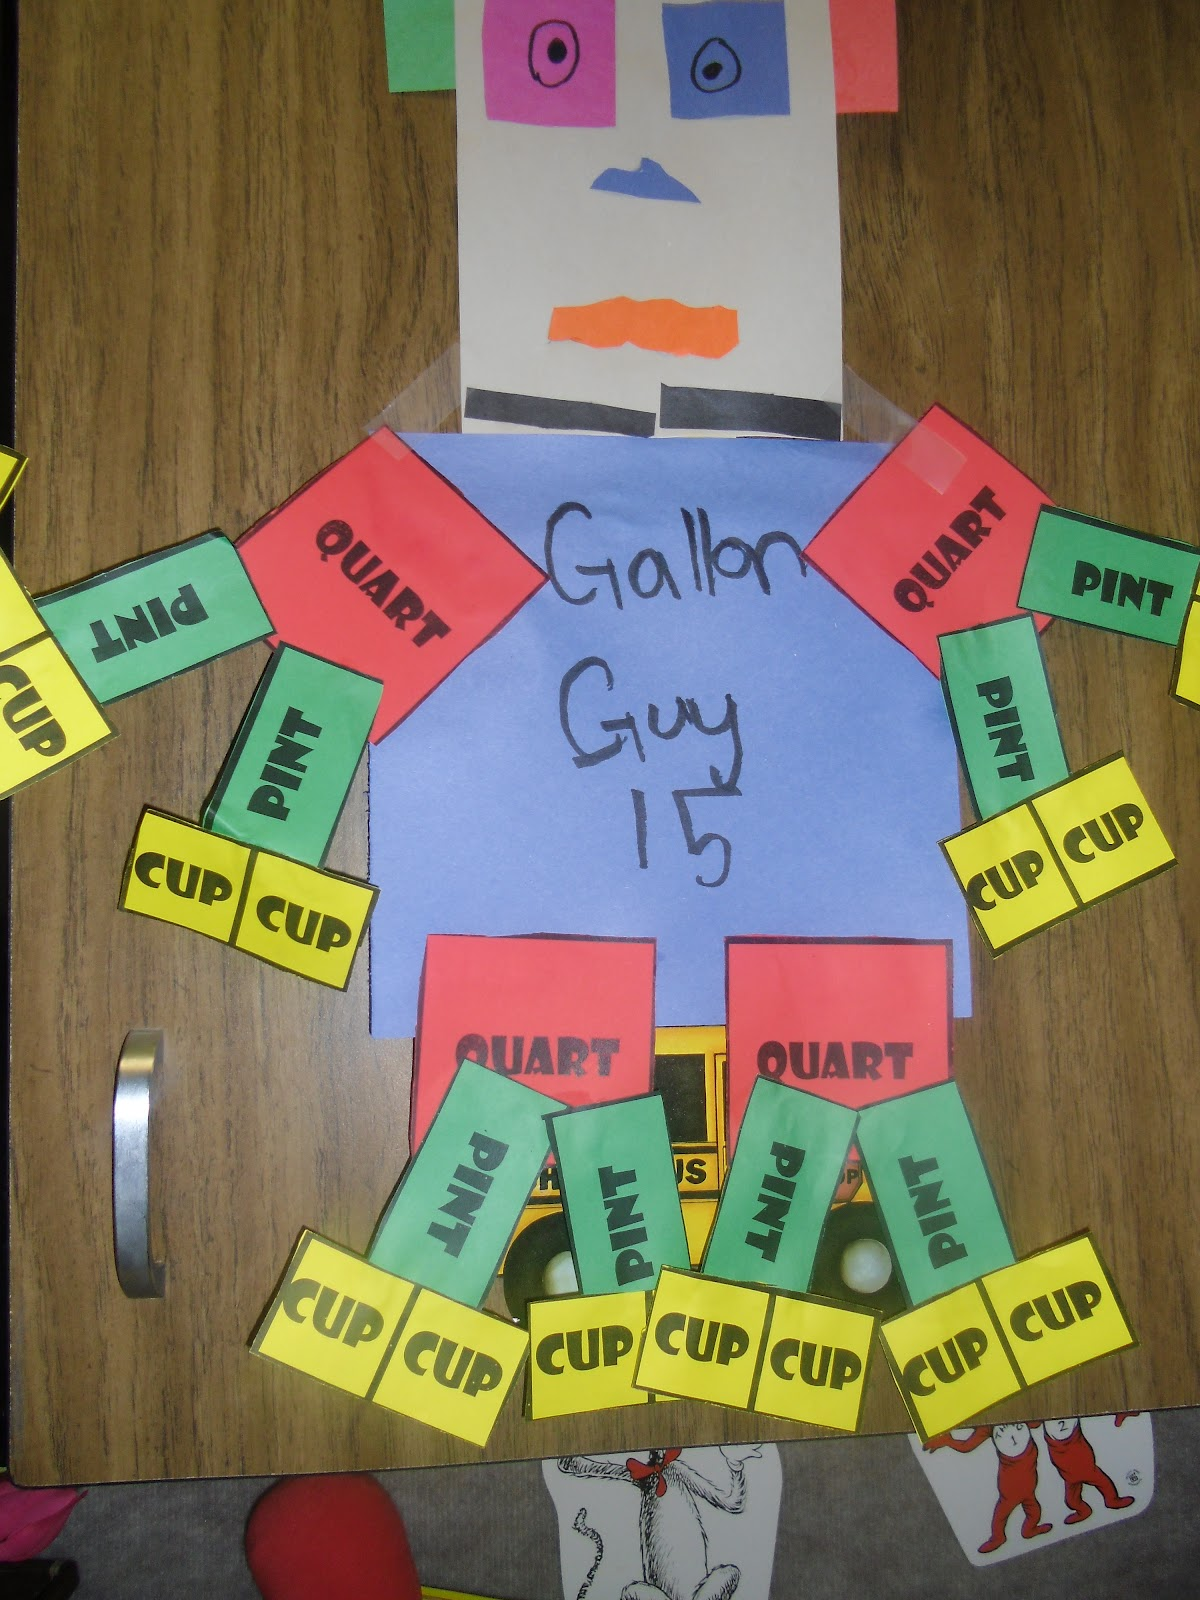 Patties Classroom Gallon Guy Measurement Man